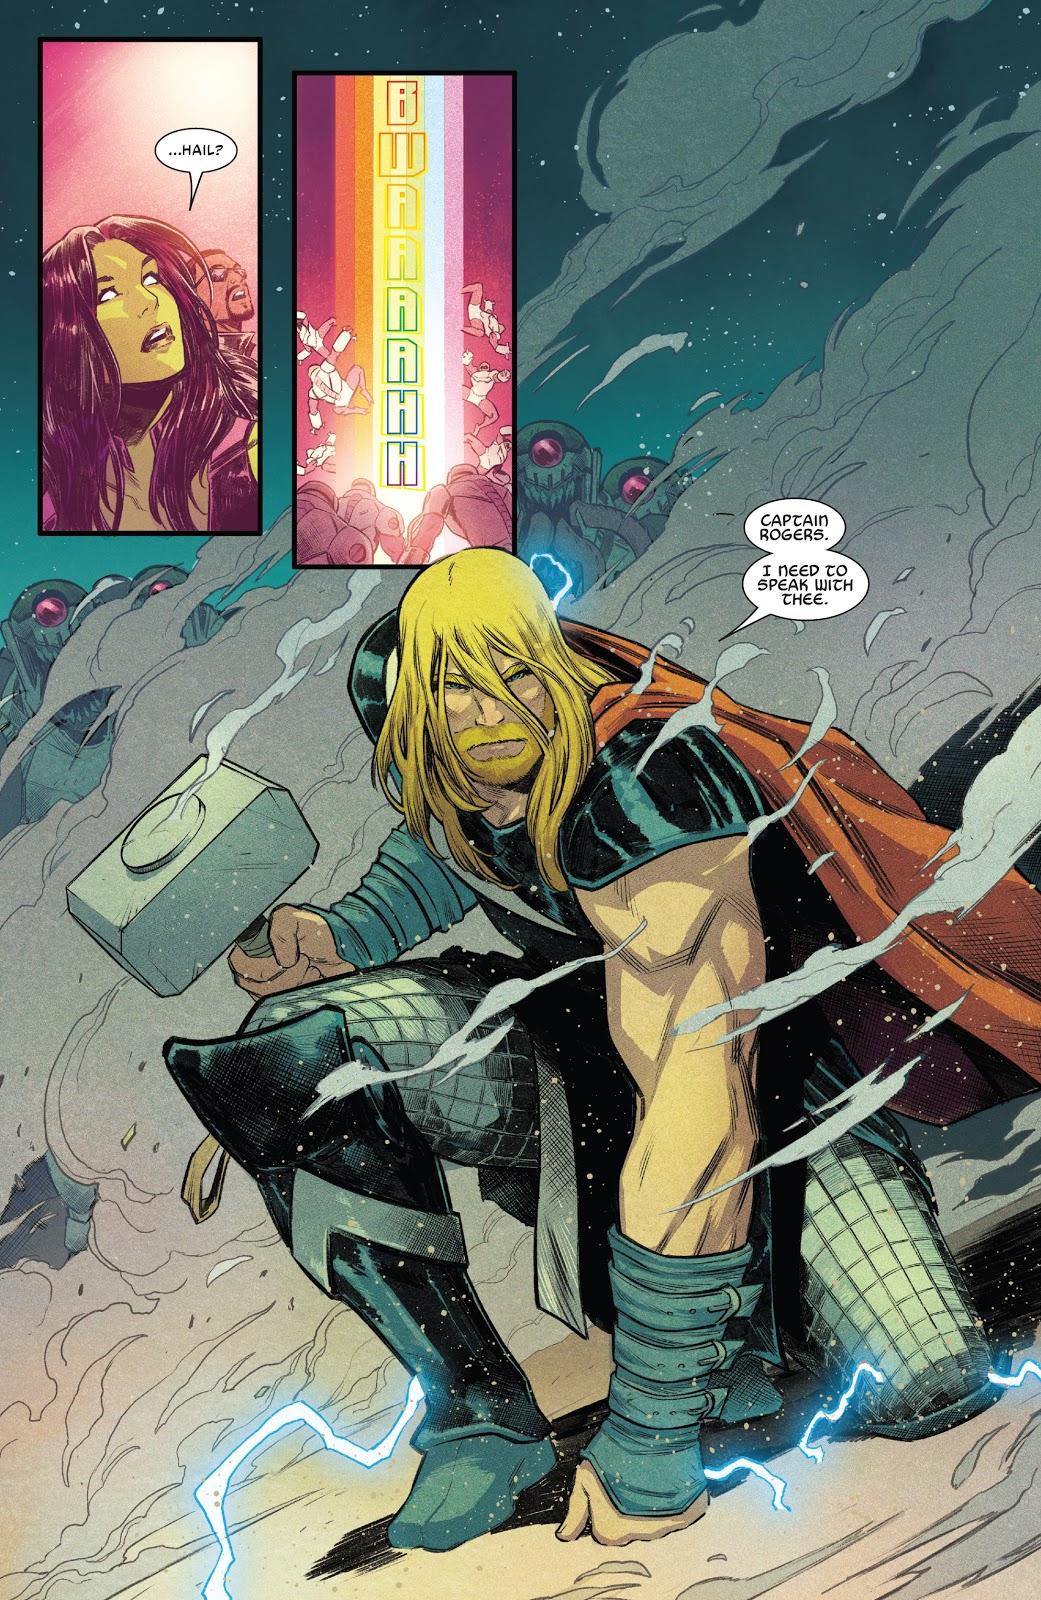 The Avengers (Thor Vol. 6 #15)